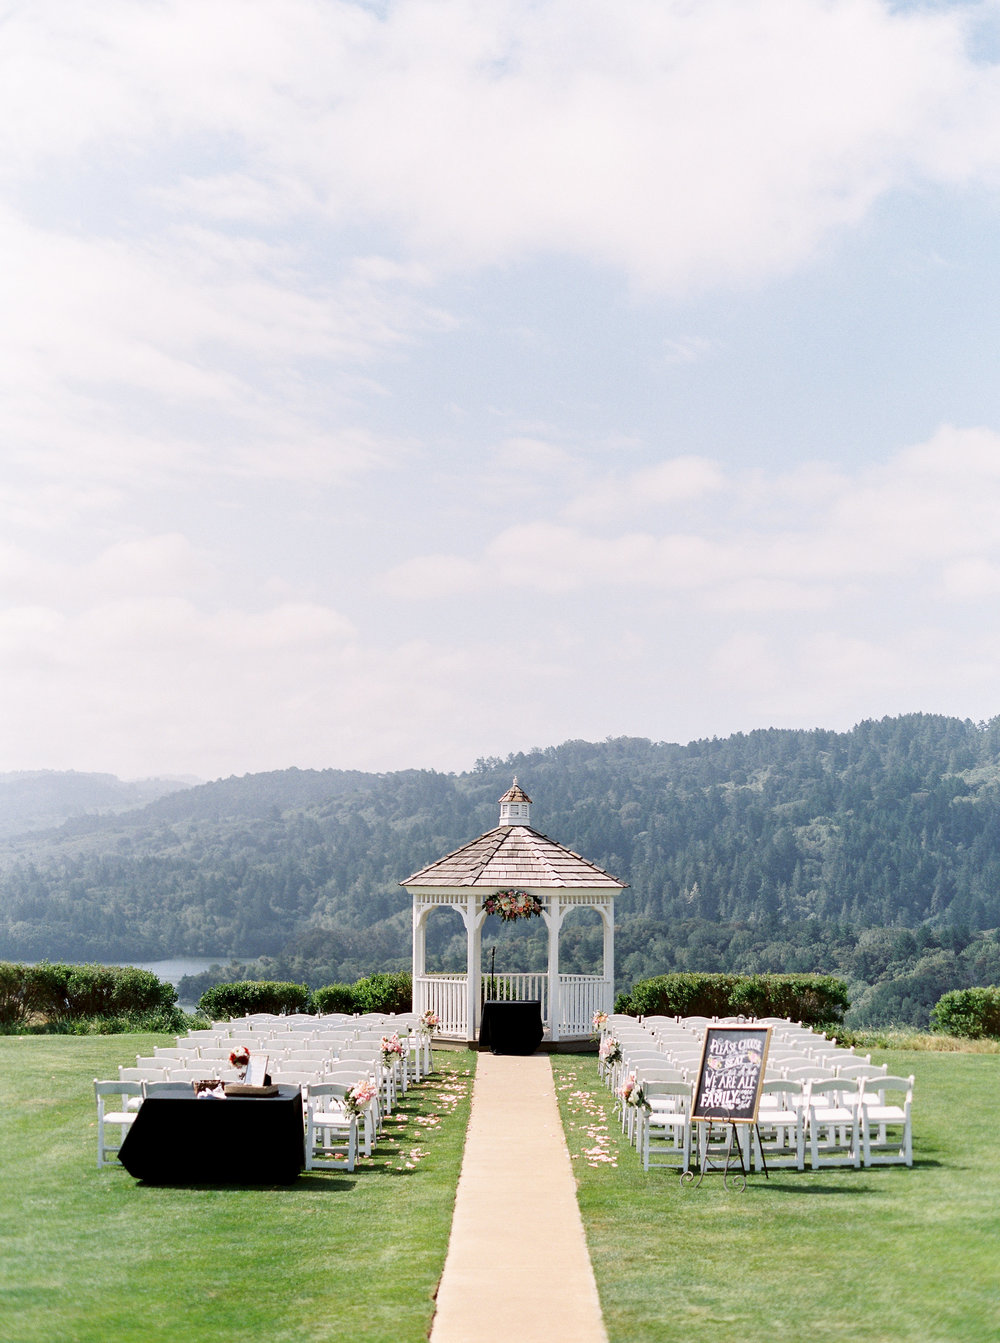 mountaintop-wedding-at-crystal-springs-burlingame-california-34.jpg